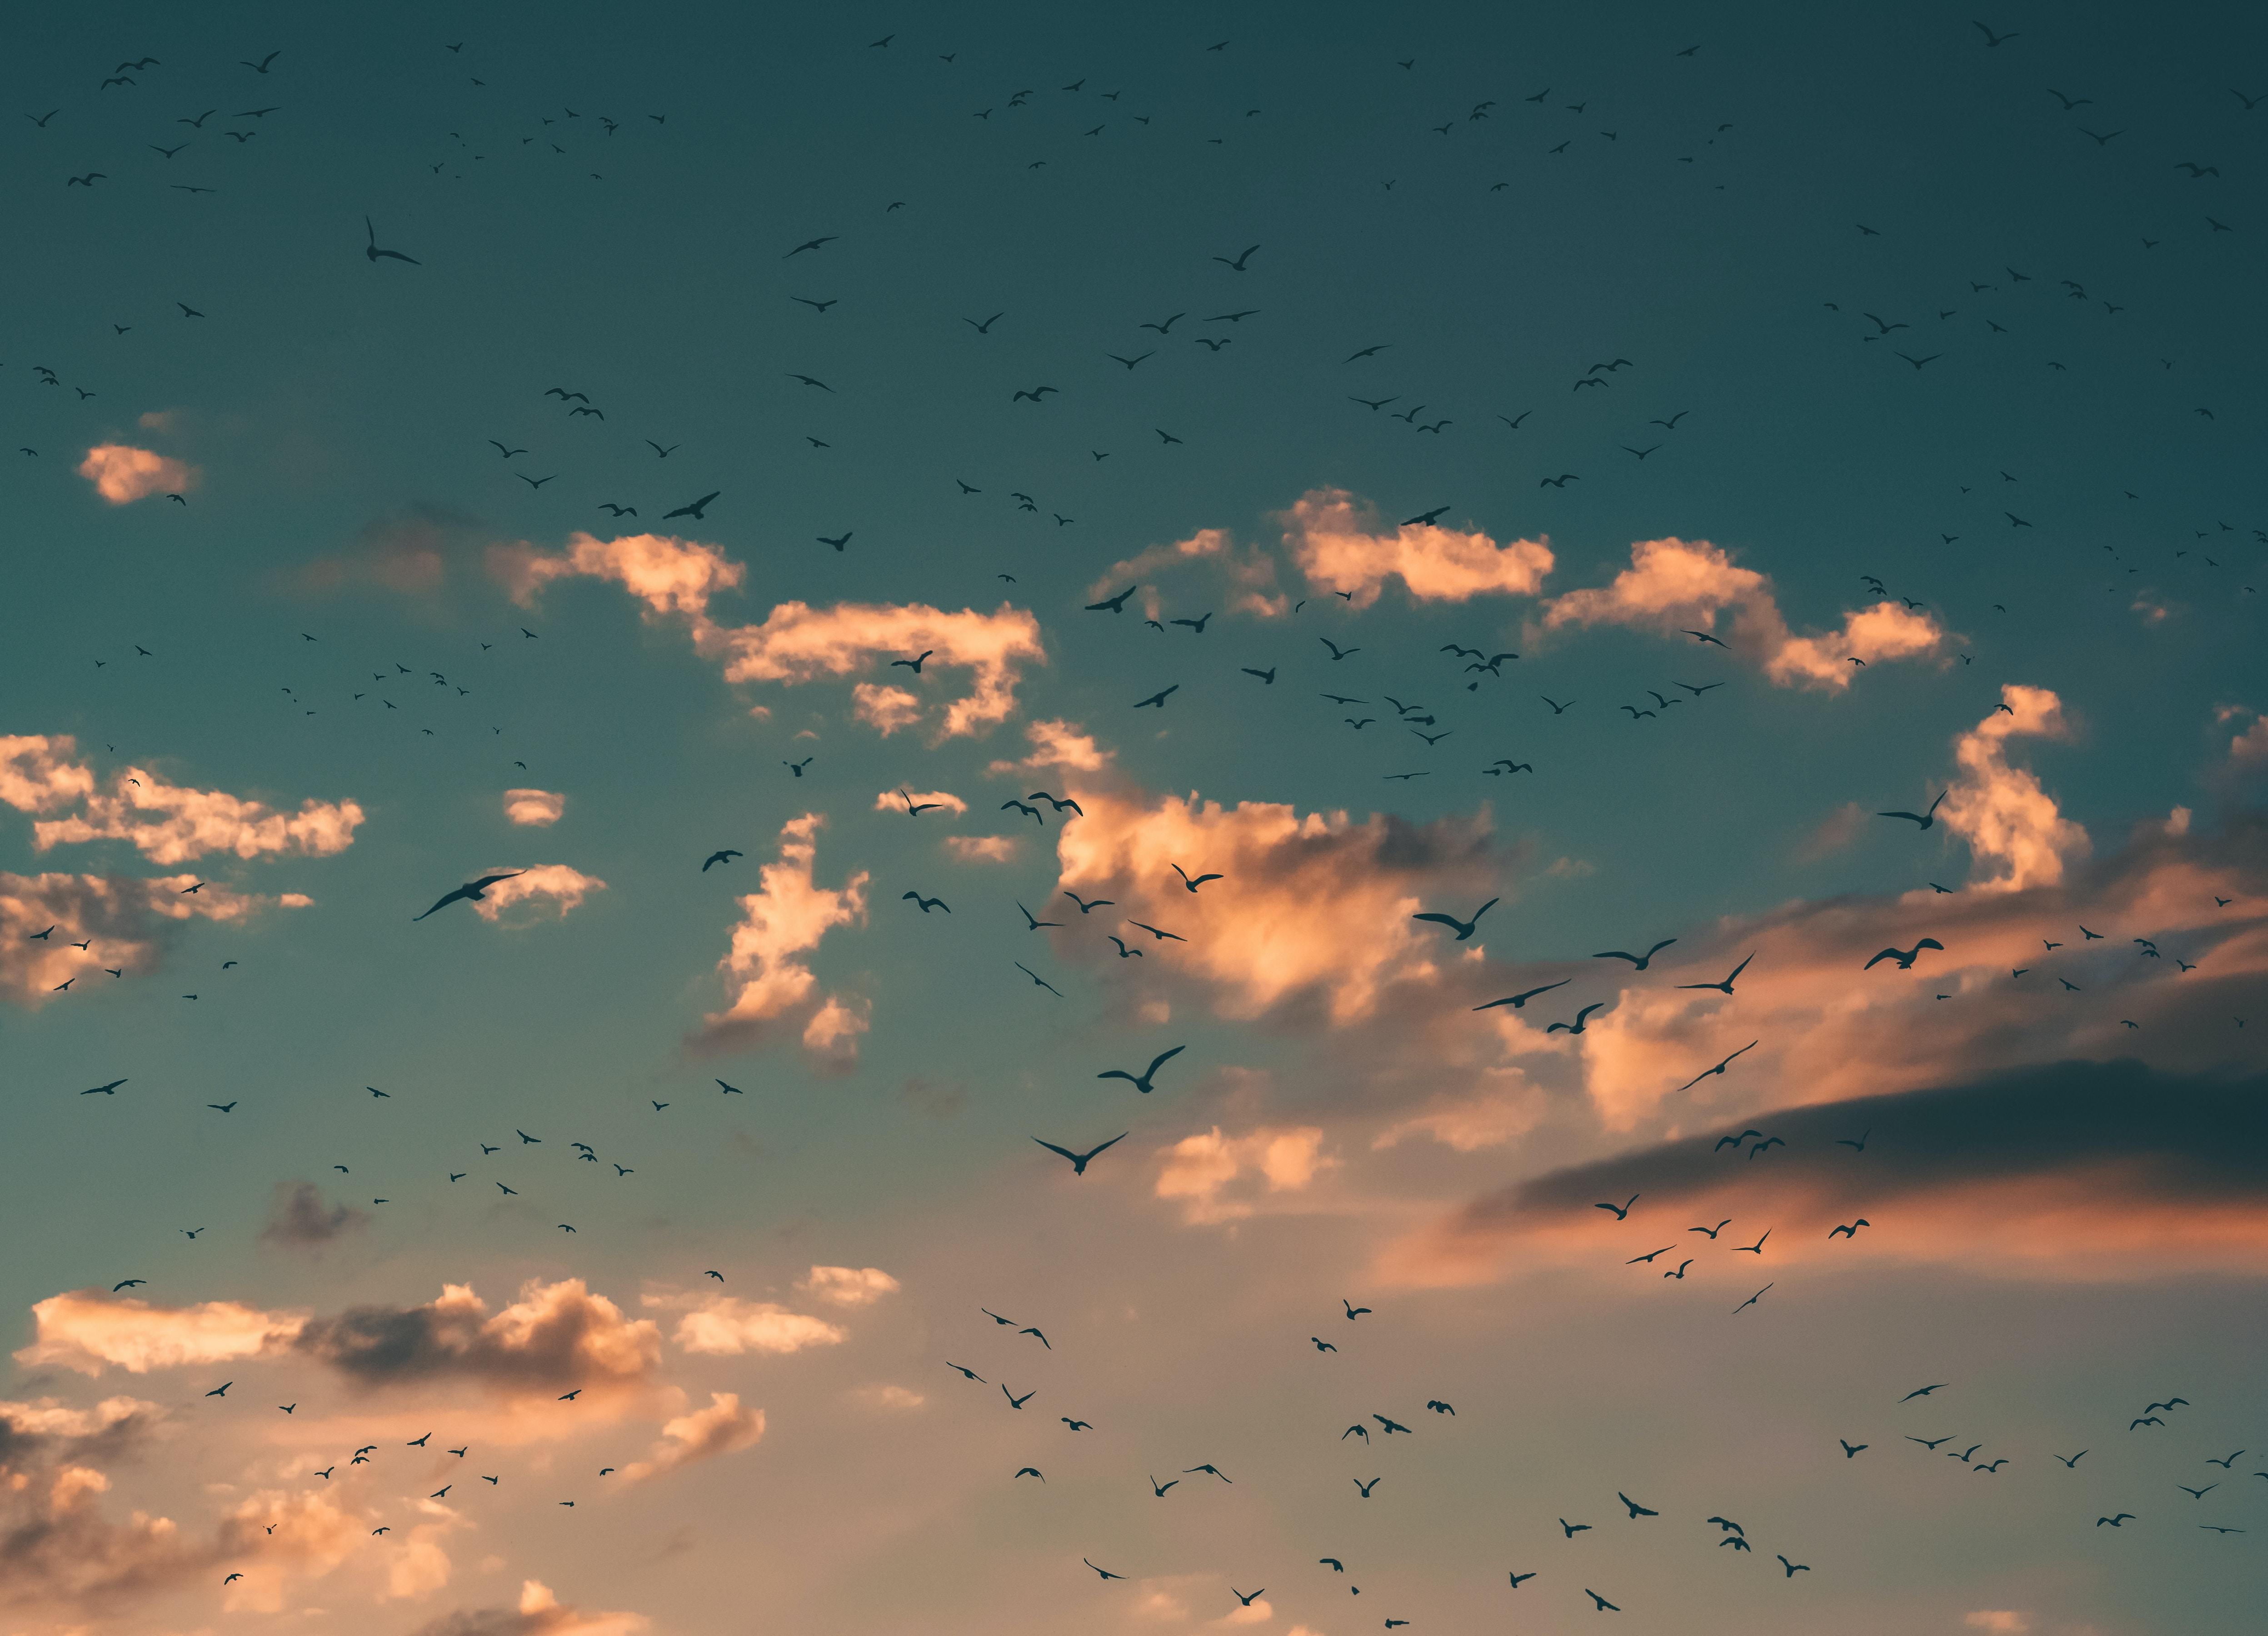 flying birds during sunset